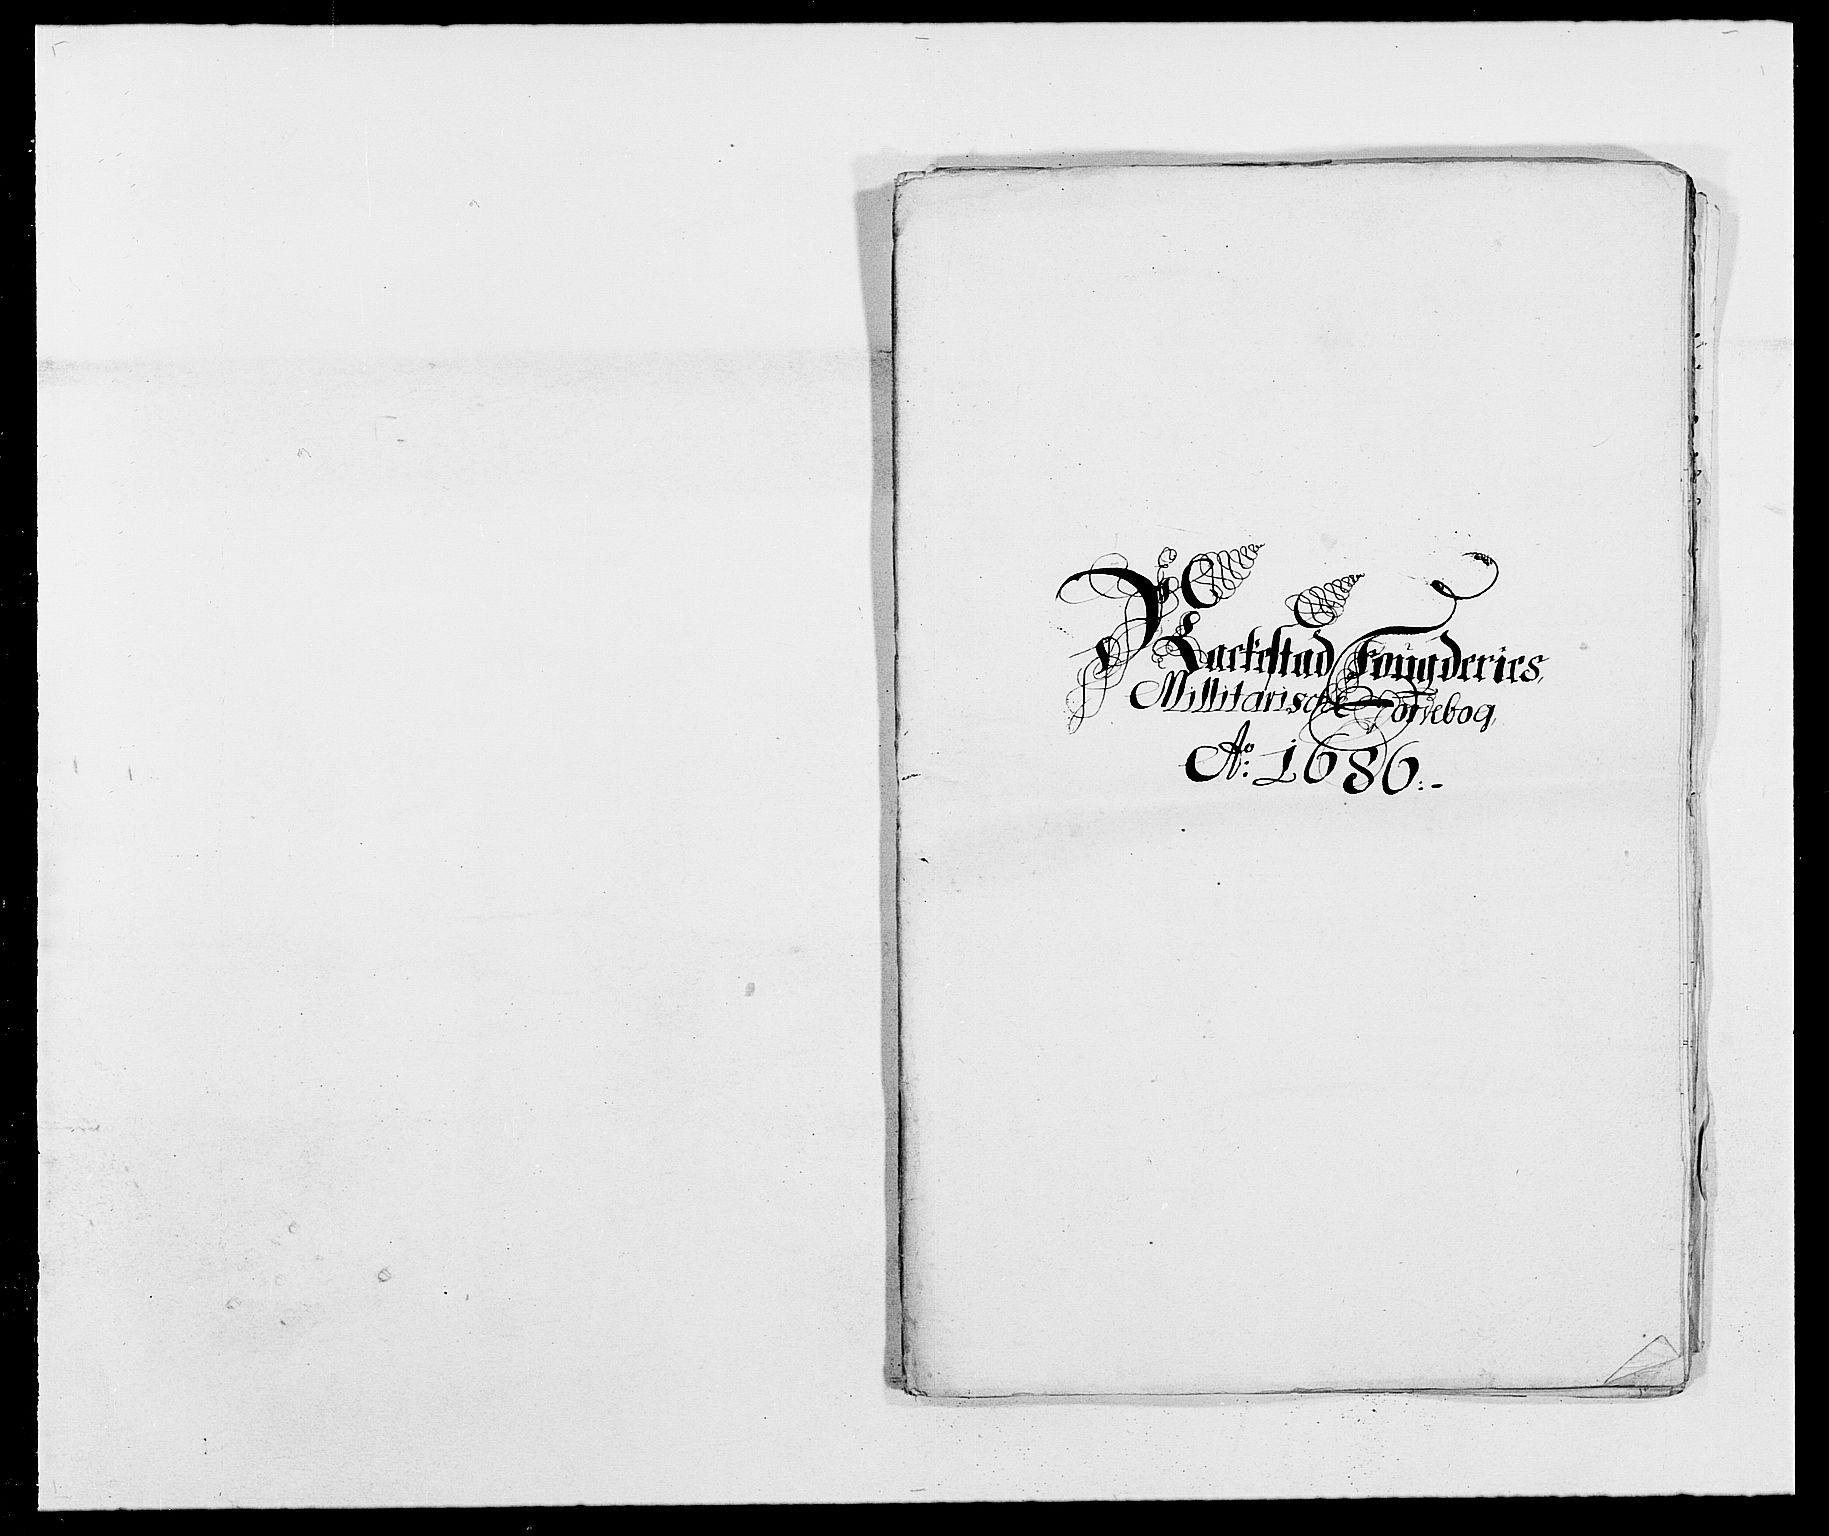 RA, Rentekammeret inntil 1814, Reviderte regnskaper, Fogderegnskap, R05/L0276: Fogderegnskap Rakkestad, 1683-1688, s. 288